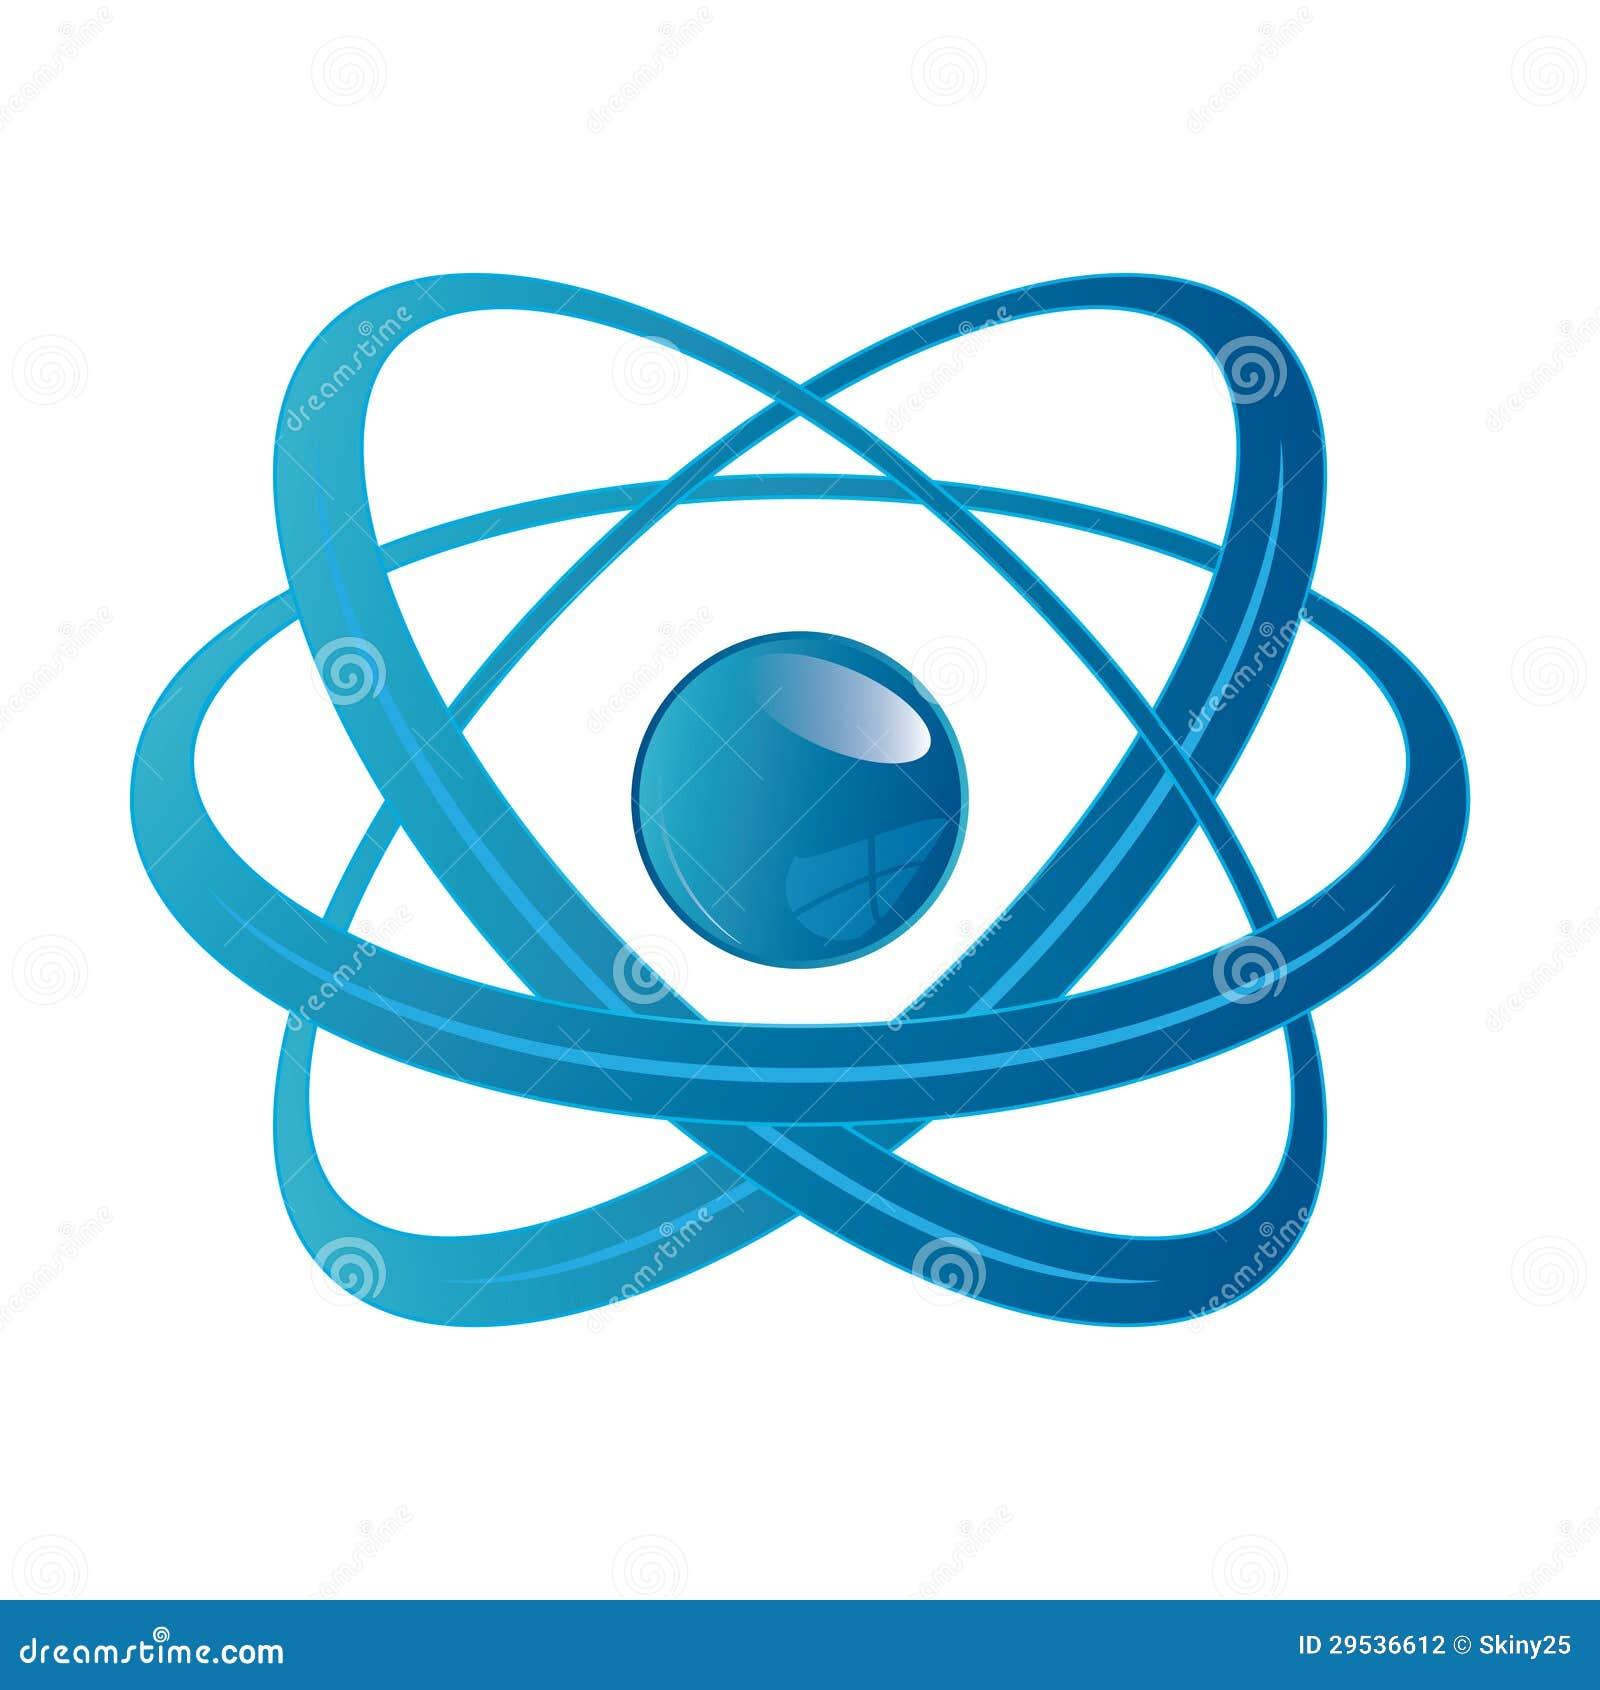 Peça do átomo no fundo branco.